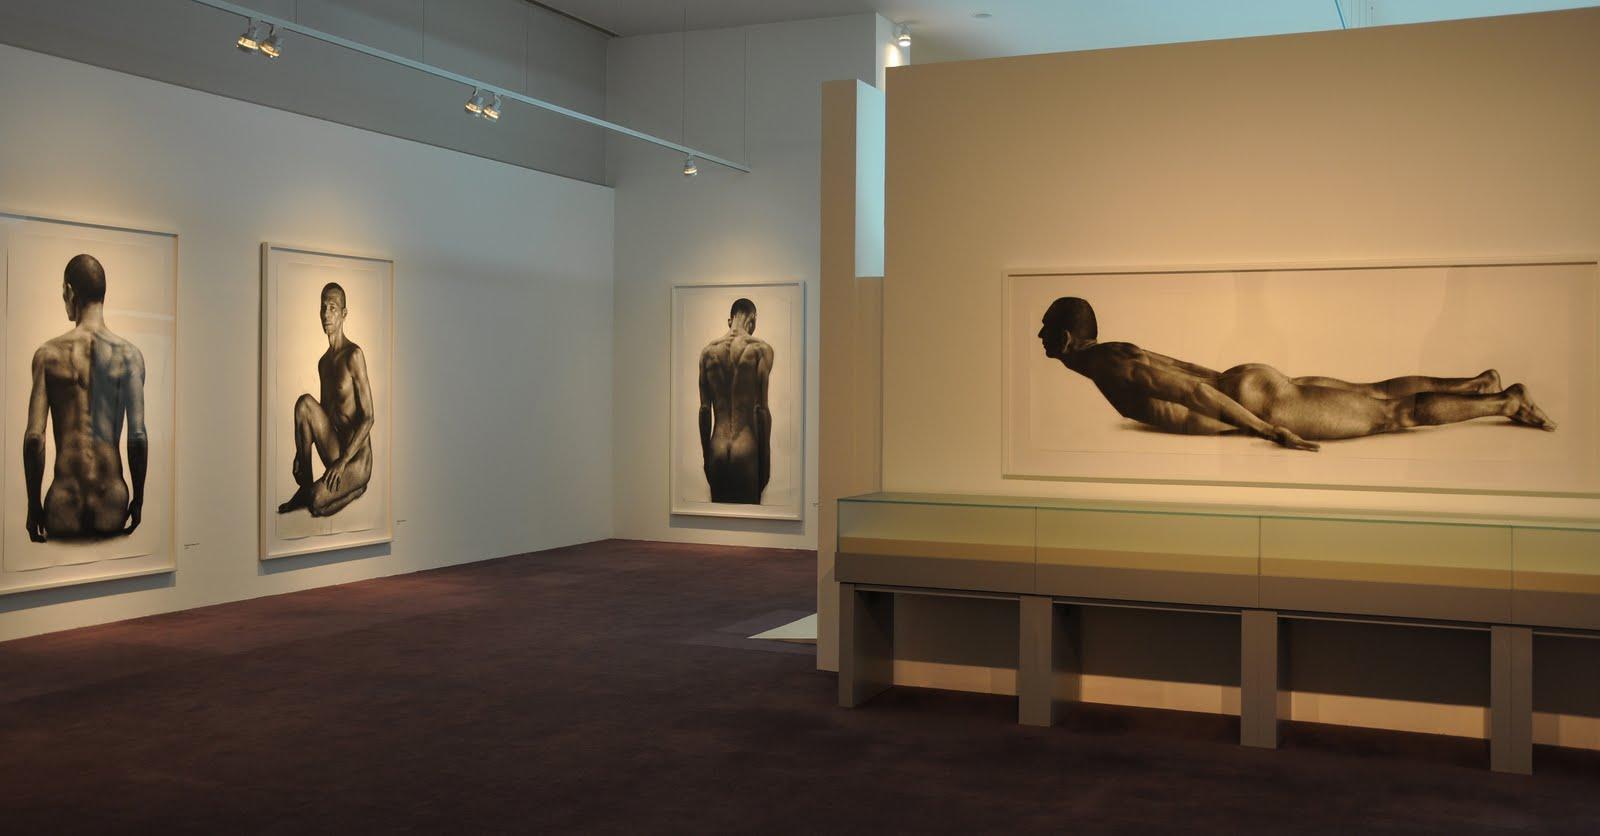 NUS+Museum+Gallery+shot+%283%29+Image+courtesy+of+NUS+Museum.JPG